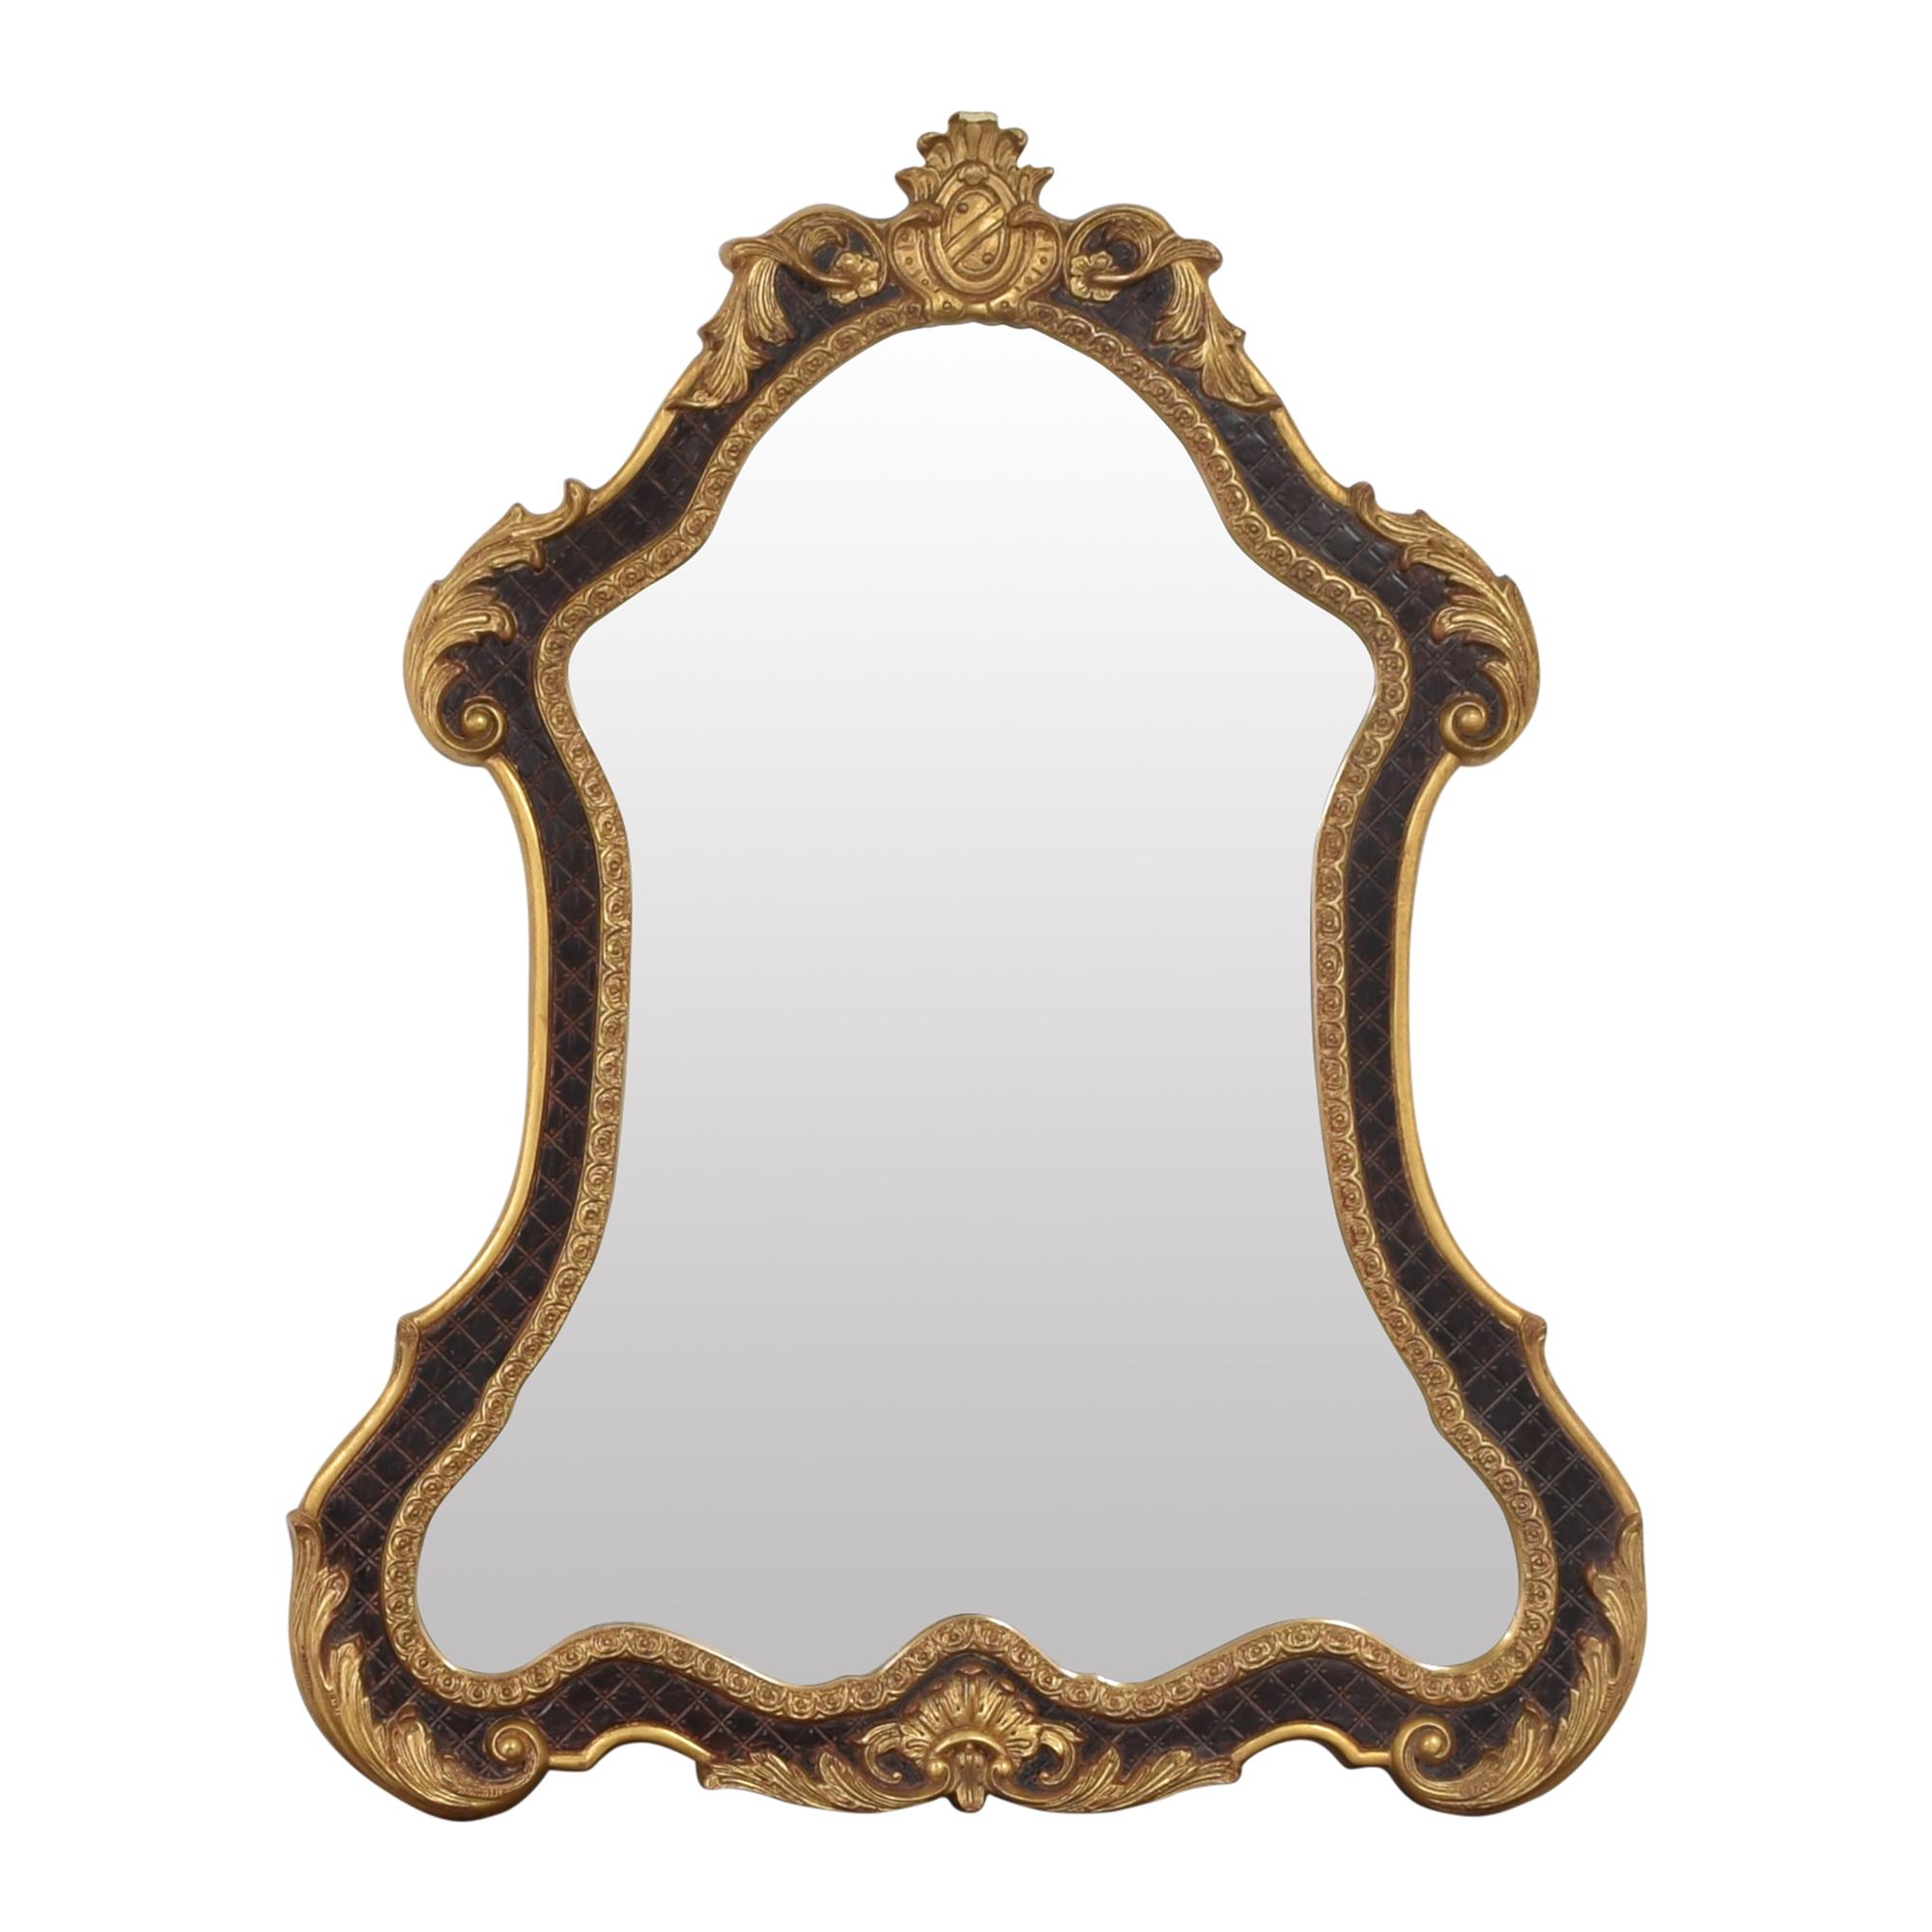 buy Ethan Allen Italian Rococo Mirror Ethan Allen Mirrors